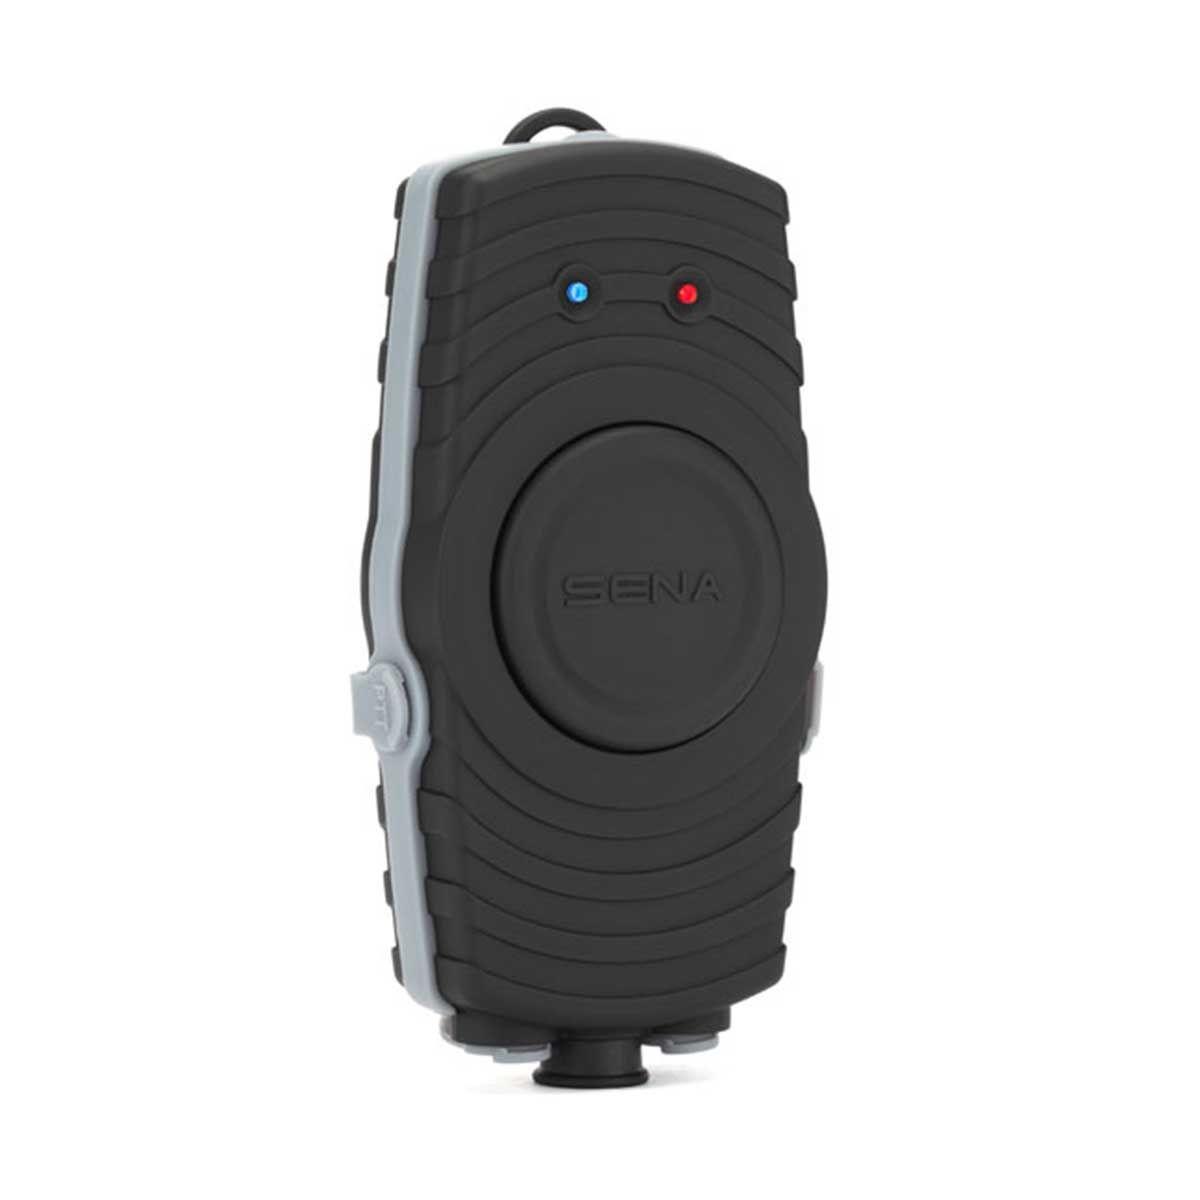 Sena SR10 Bluetooth Two-way Radio Adapter (SR10-10)